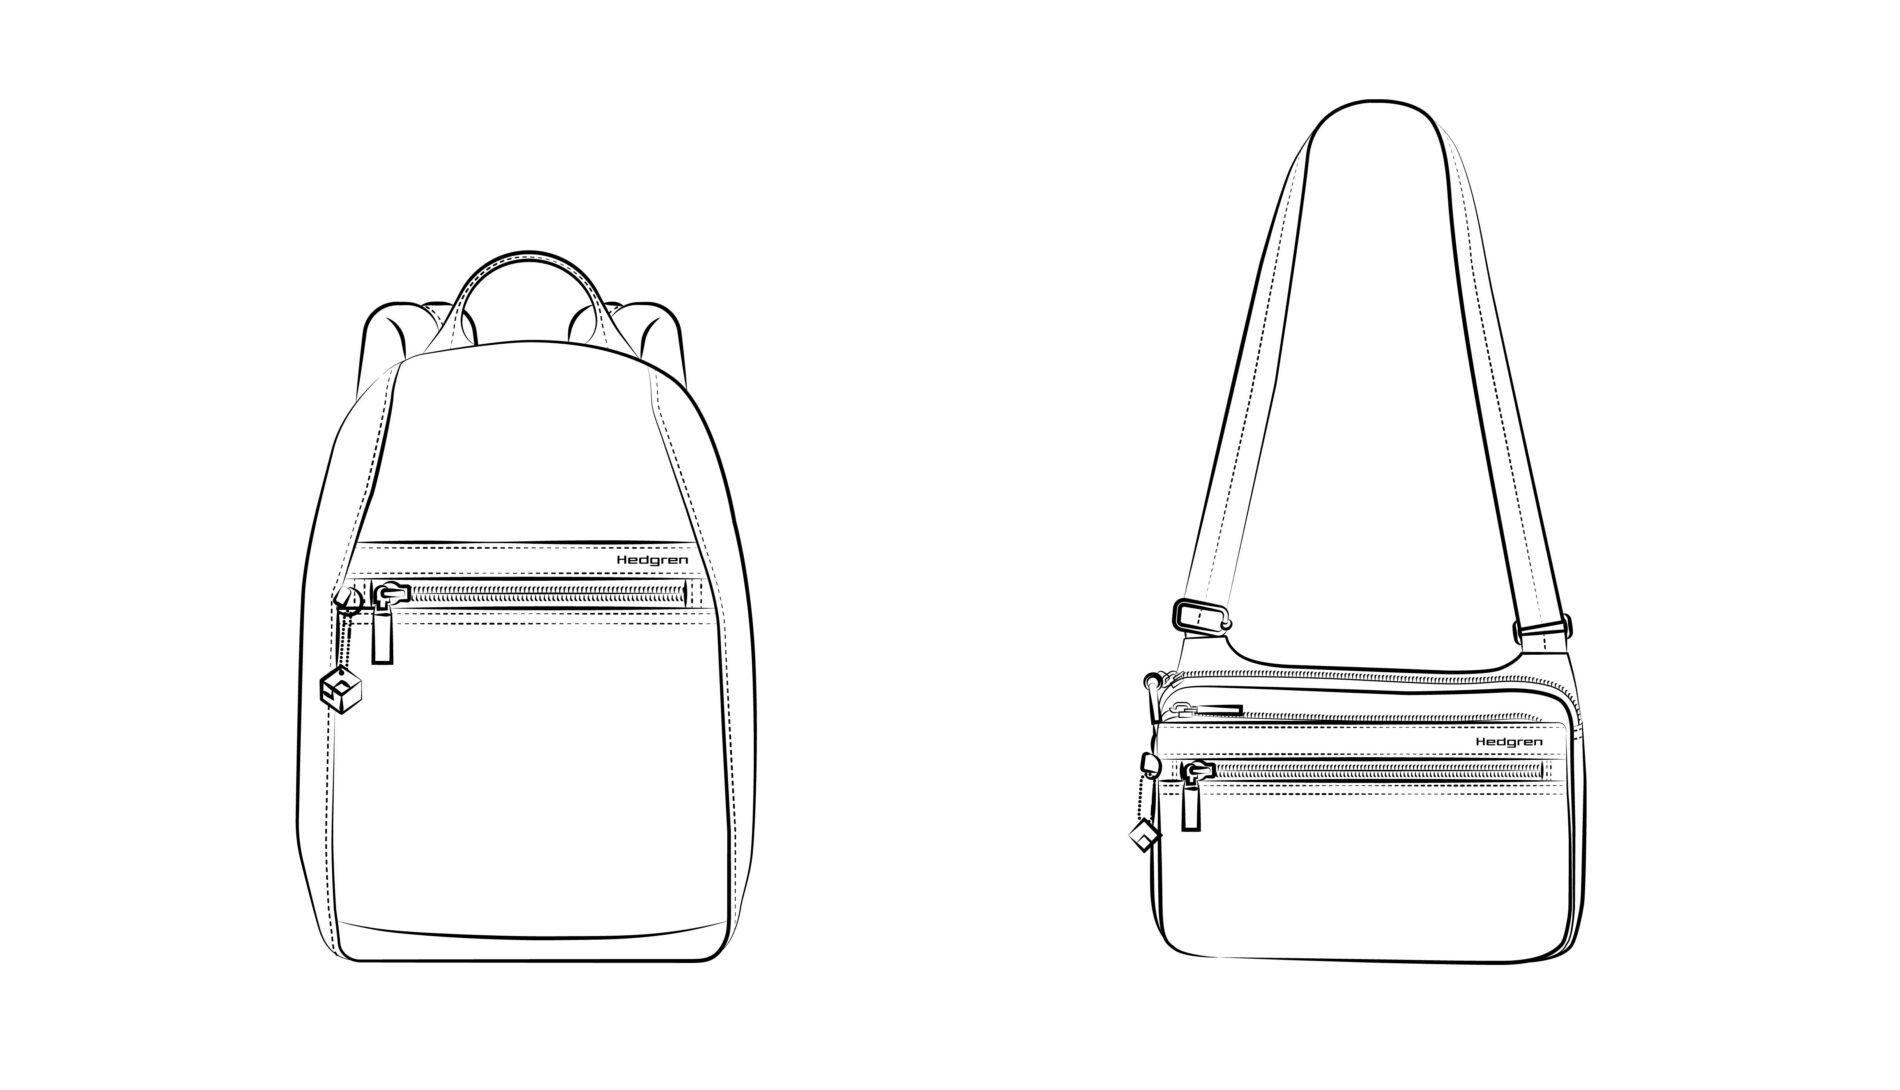 Illustratie van tassen